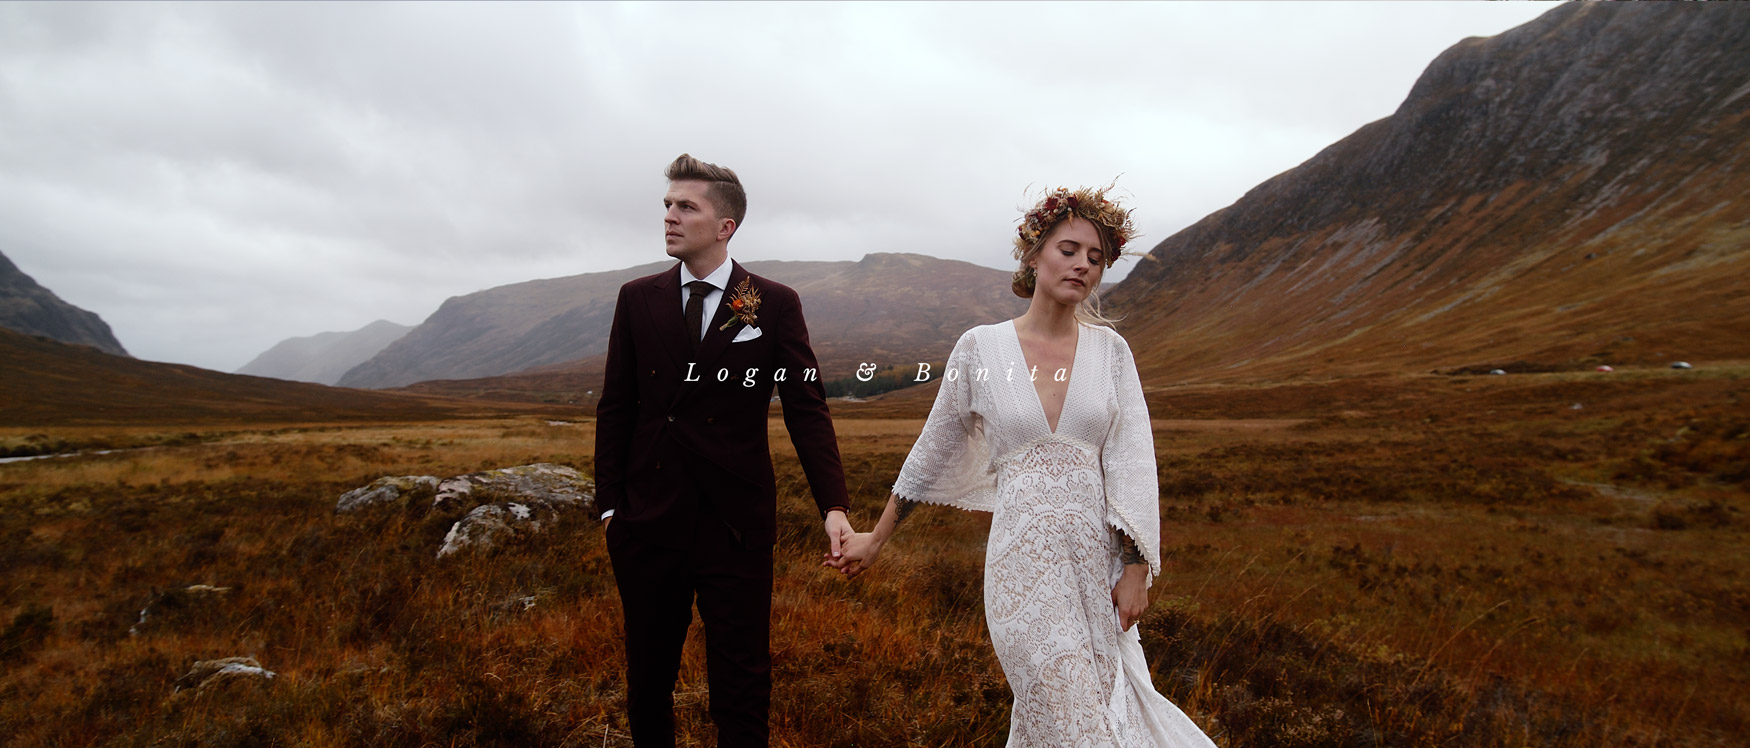 logan-bonita-schotland-scotland-glencoe-elopement-bruiloft-videograaf-trouwfilm-videographer-dreamers-amsterdam-trouwvideo-destination-wedding-web-1750px